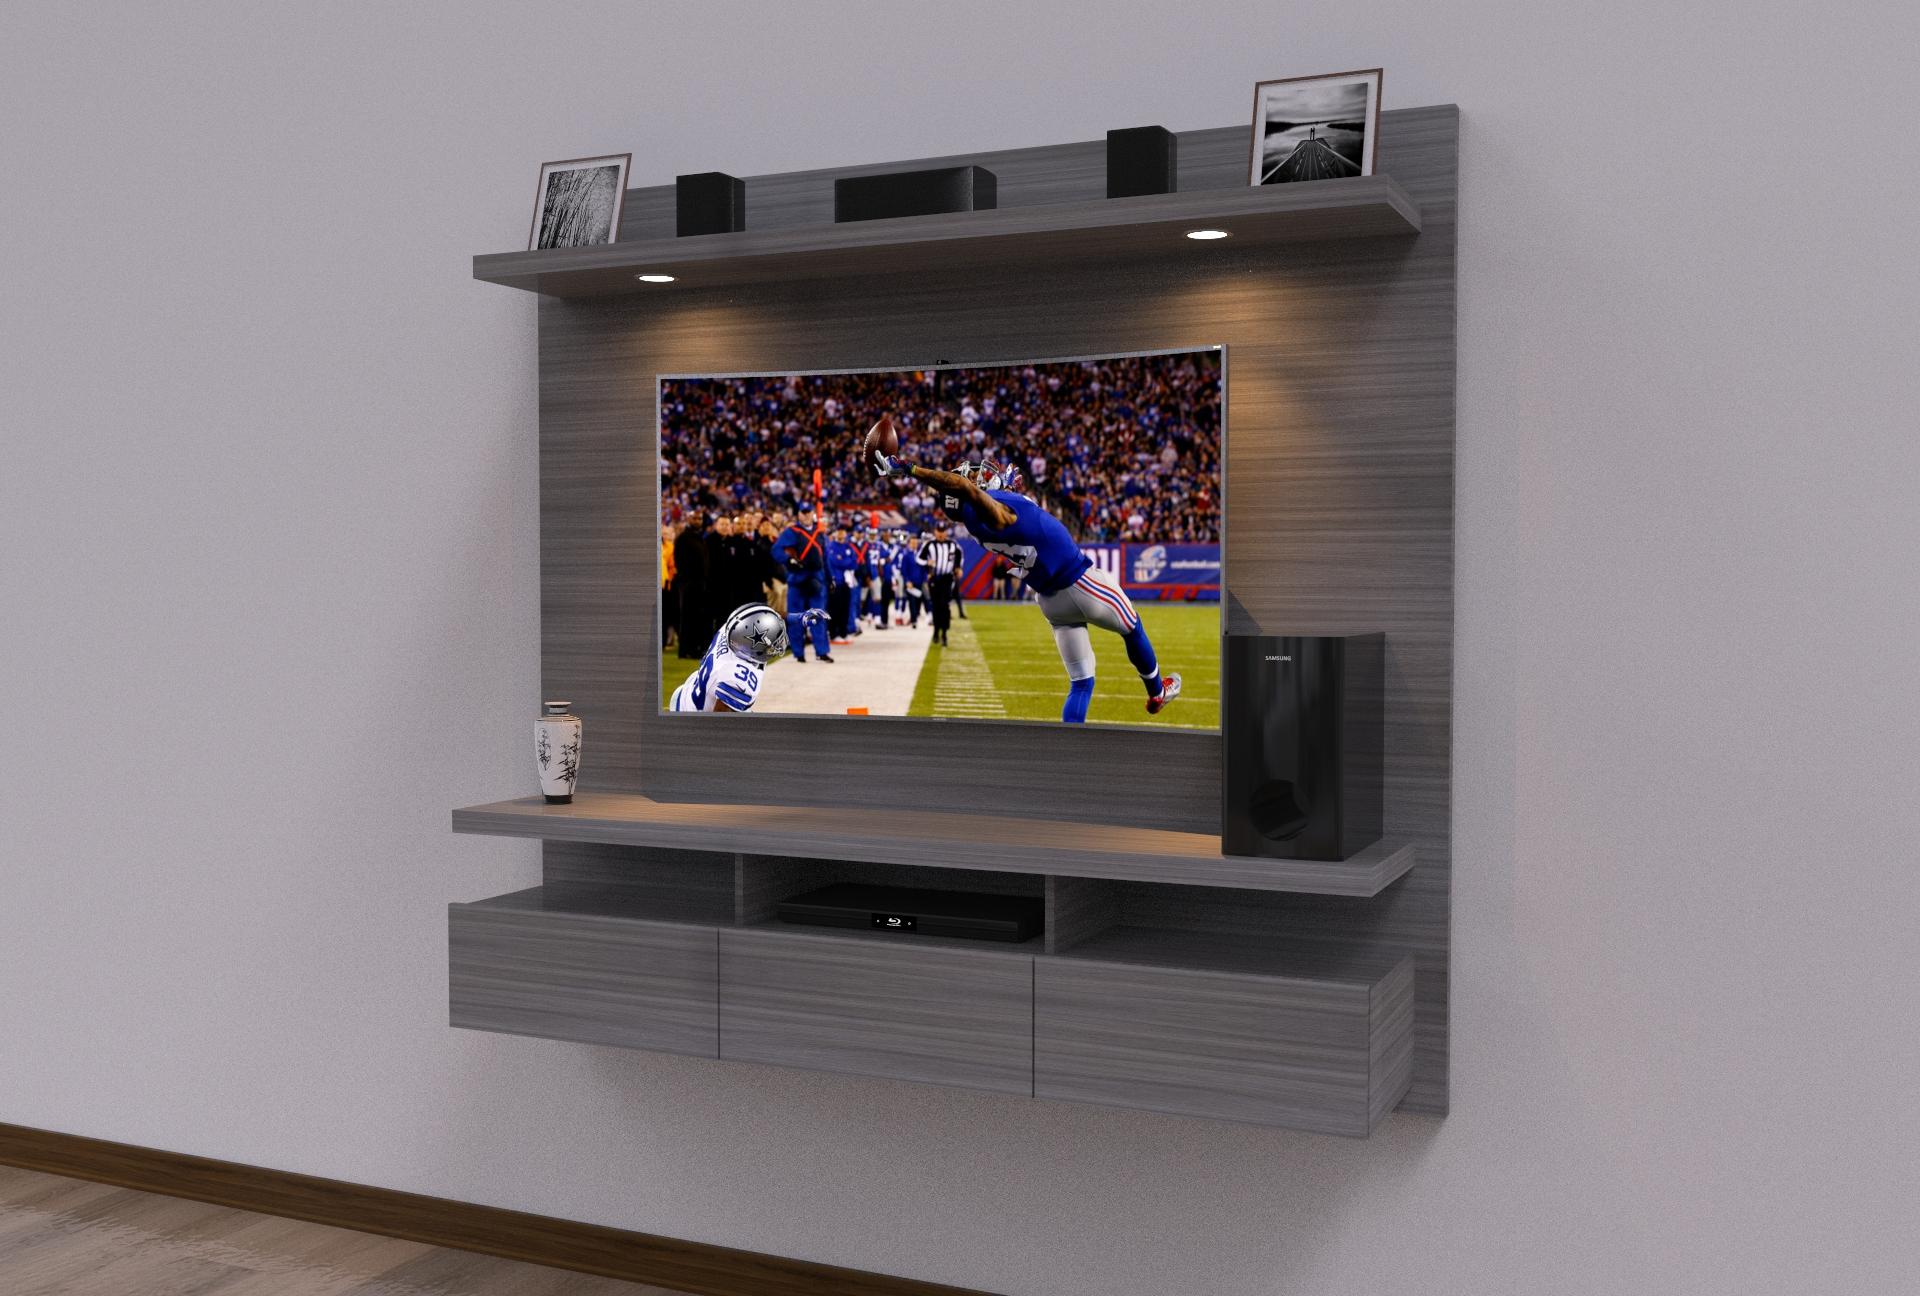 Mueble Flotante Para Tv Spretto Muebles Para Tv Centros